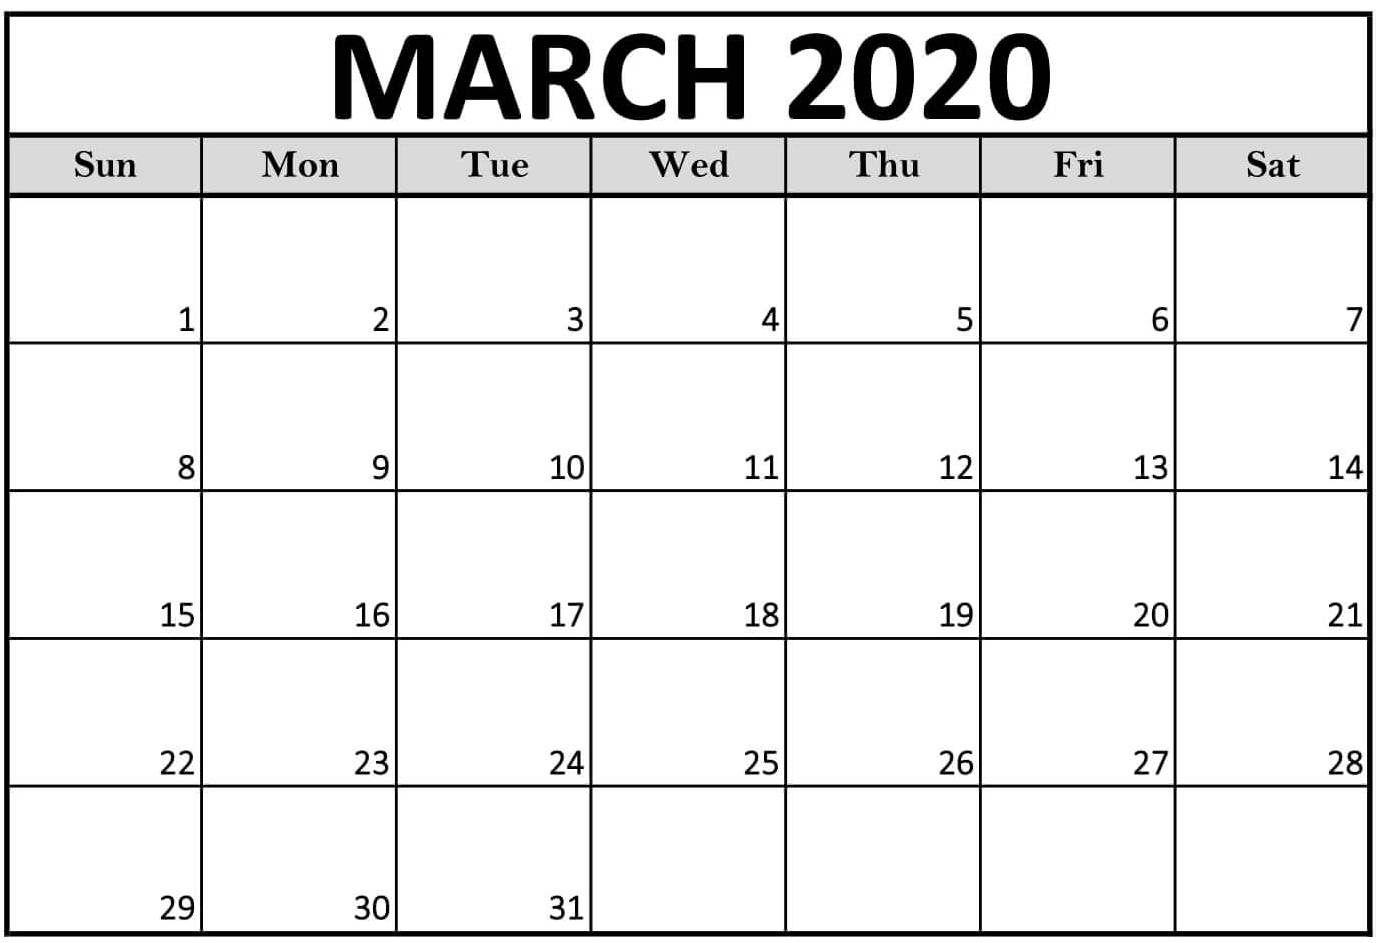 Editable Calendar Template March 2020 in 2020 Blank